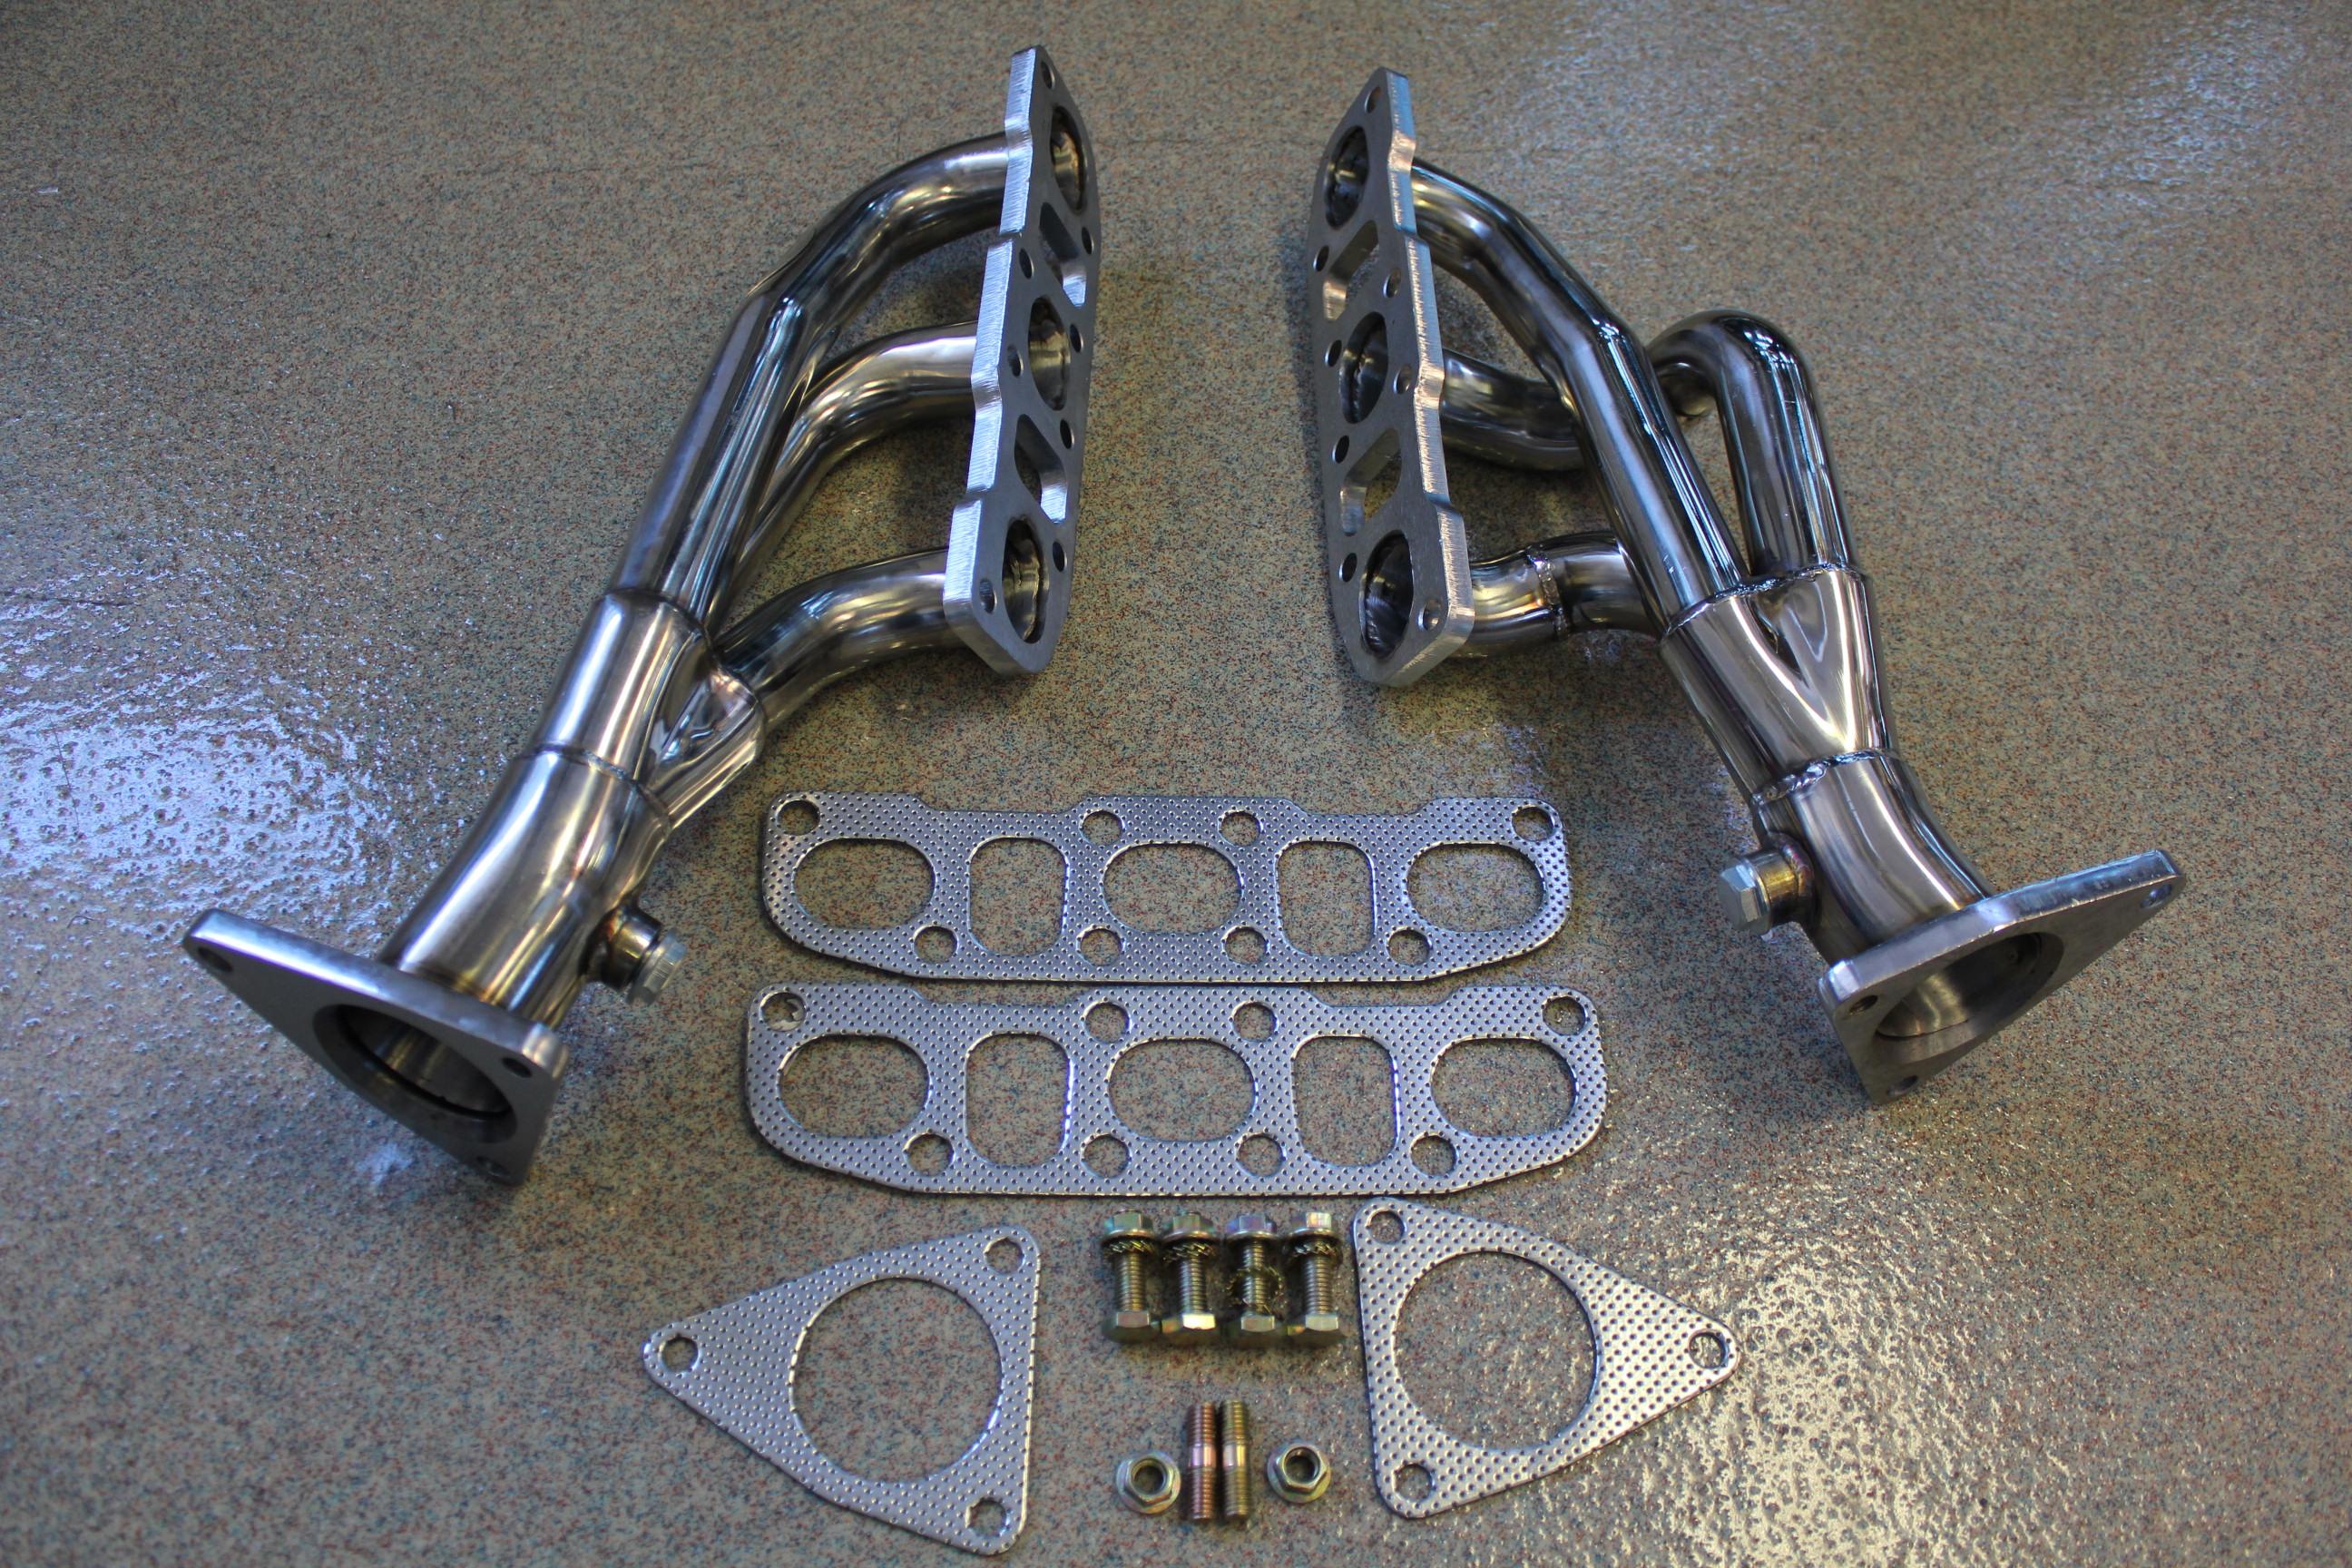 Beluga Racing Performance Headers for 09-17 Nissan 370Z & 07-08 350Z VQ37VHR